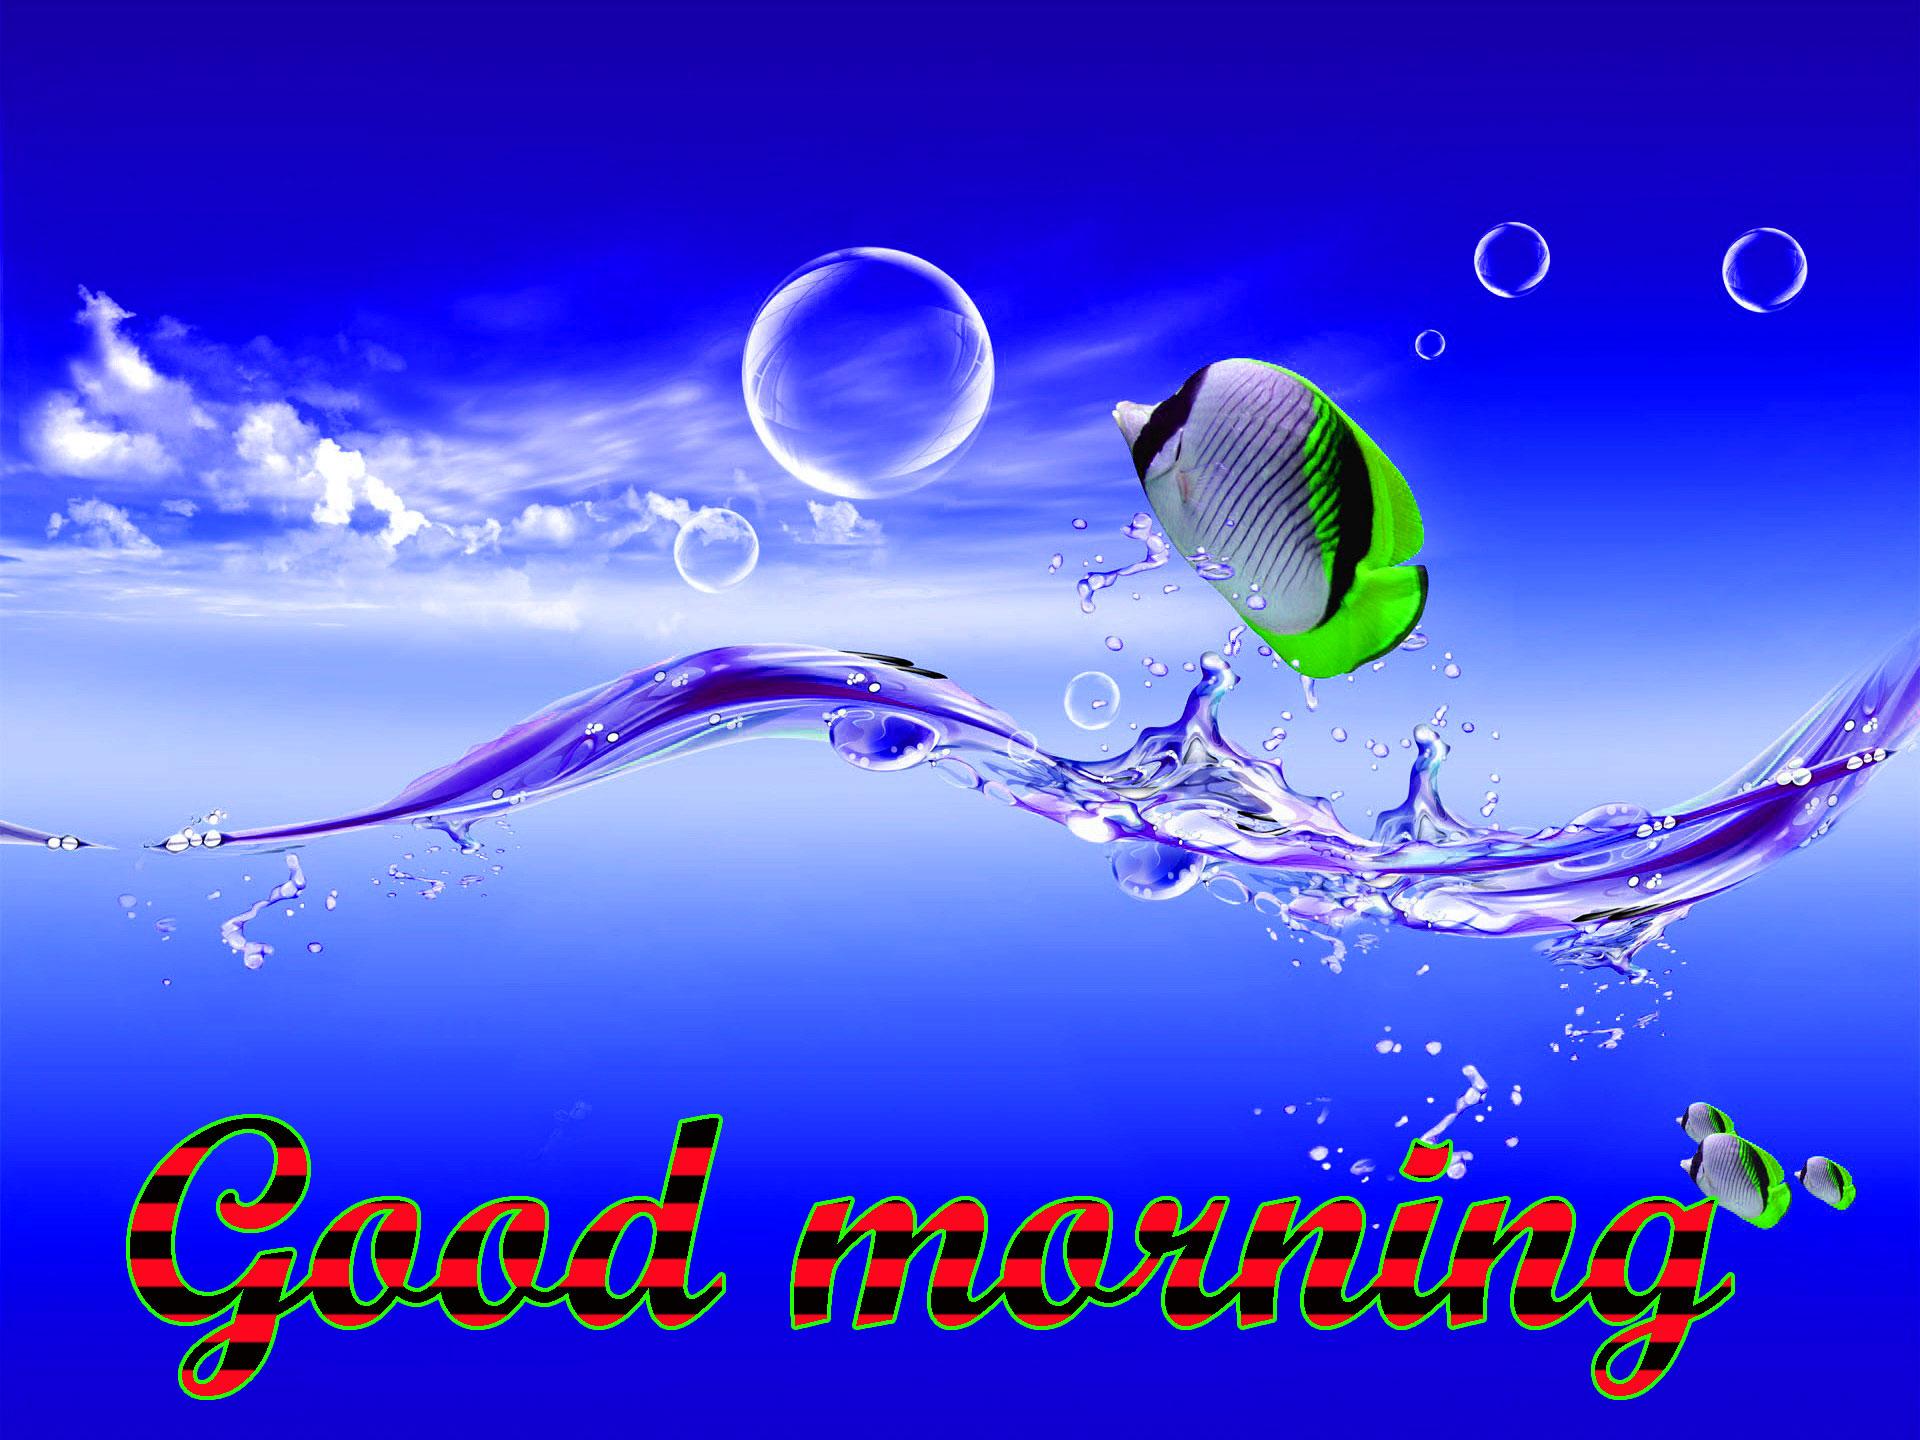 Good Morning 3d Wallpaper Free Download Hd Wallpaper Good Morning Images 3d Download 1920x1440 Download Hd Wallpaper Wallpapertip